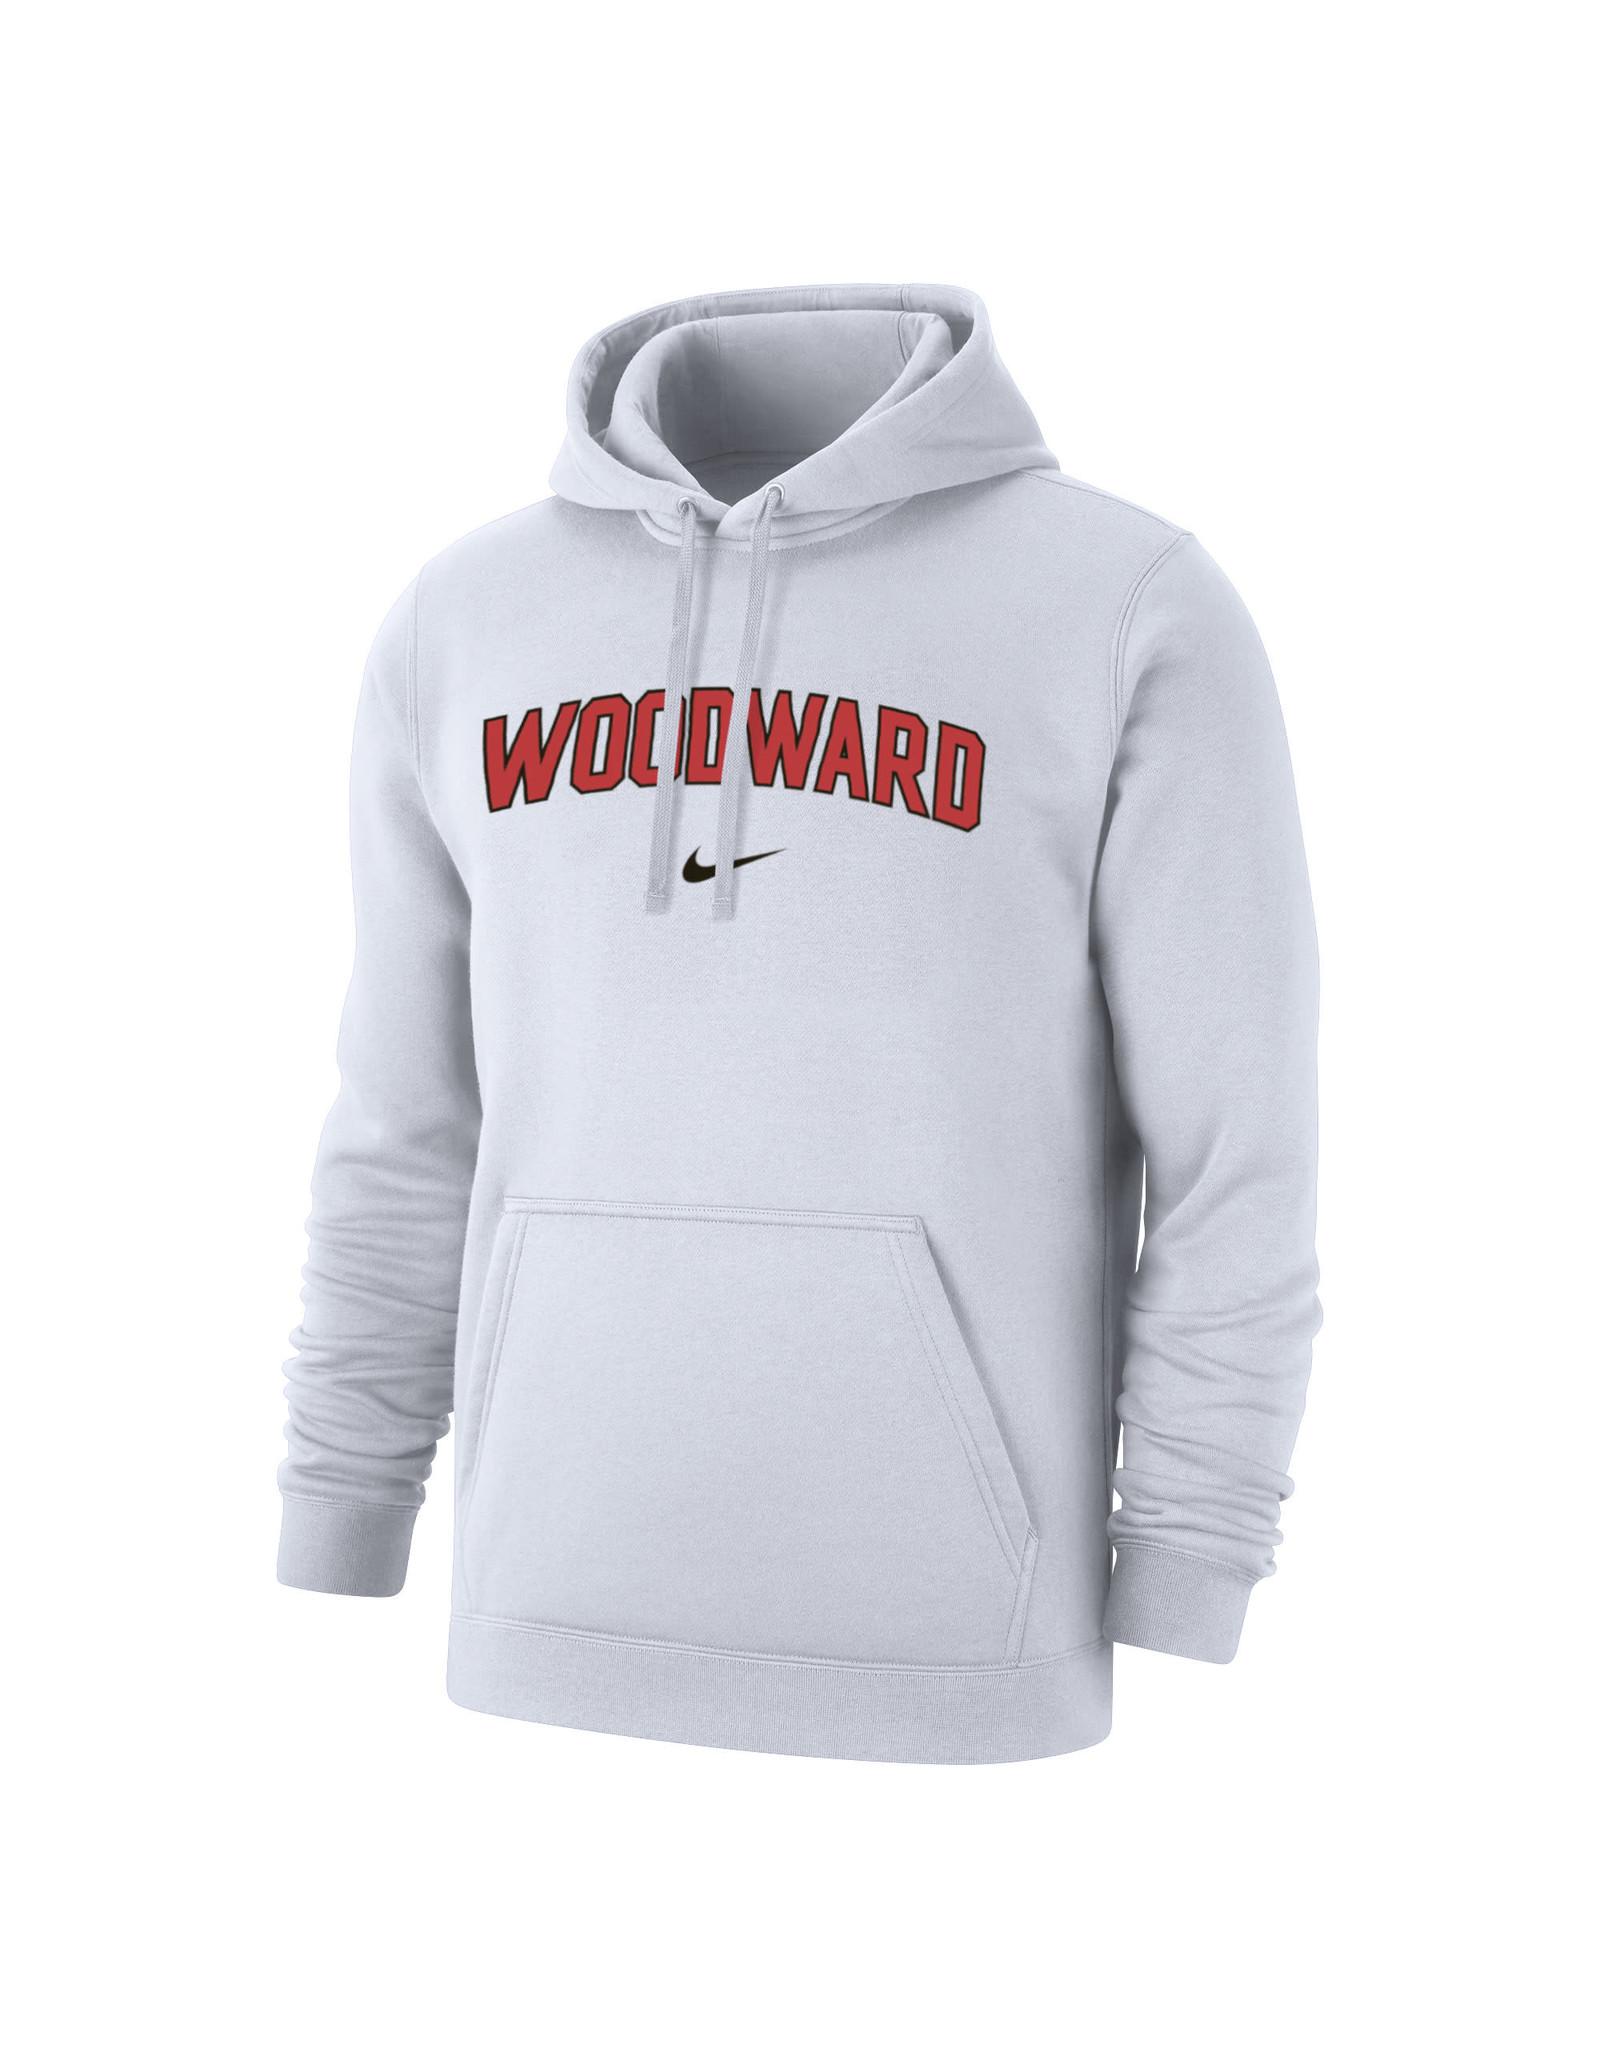 NIKE Club Fleece Hooded Sweatshirt in White